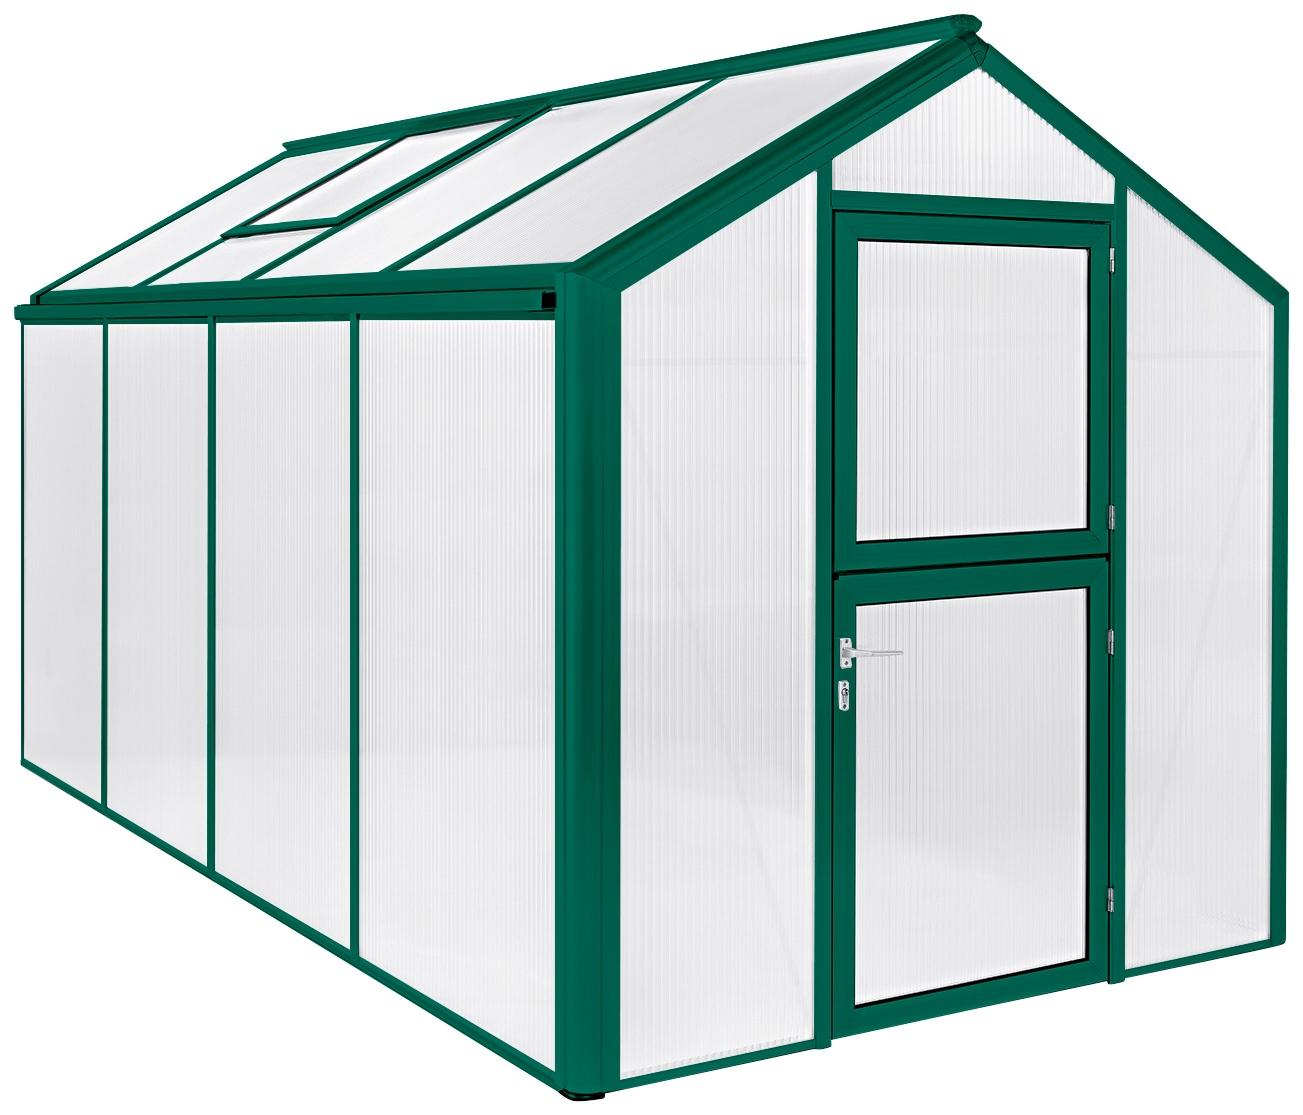 BECKMANN Gewächshaus »Allplanta U3«, BxT: 215x408 cm, grün   Garten > Gewächshäuser   Grün   BECKMANN